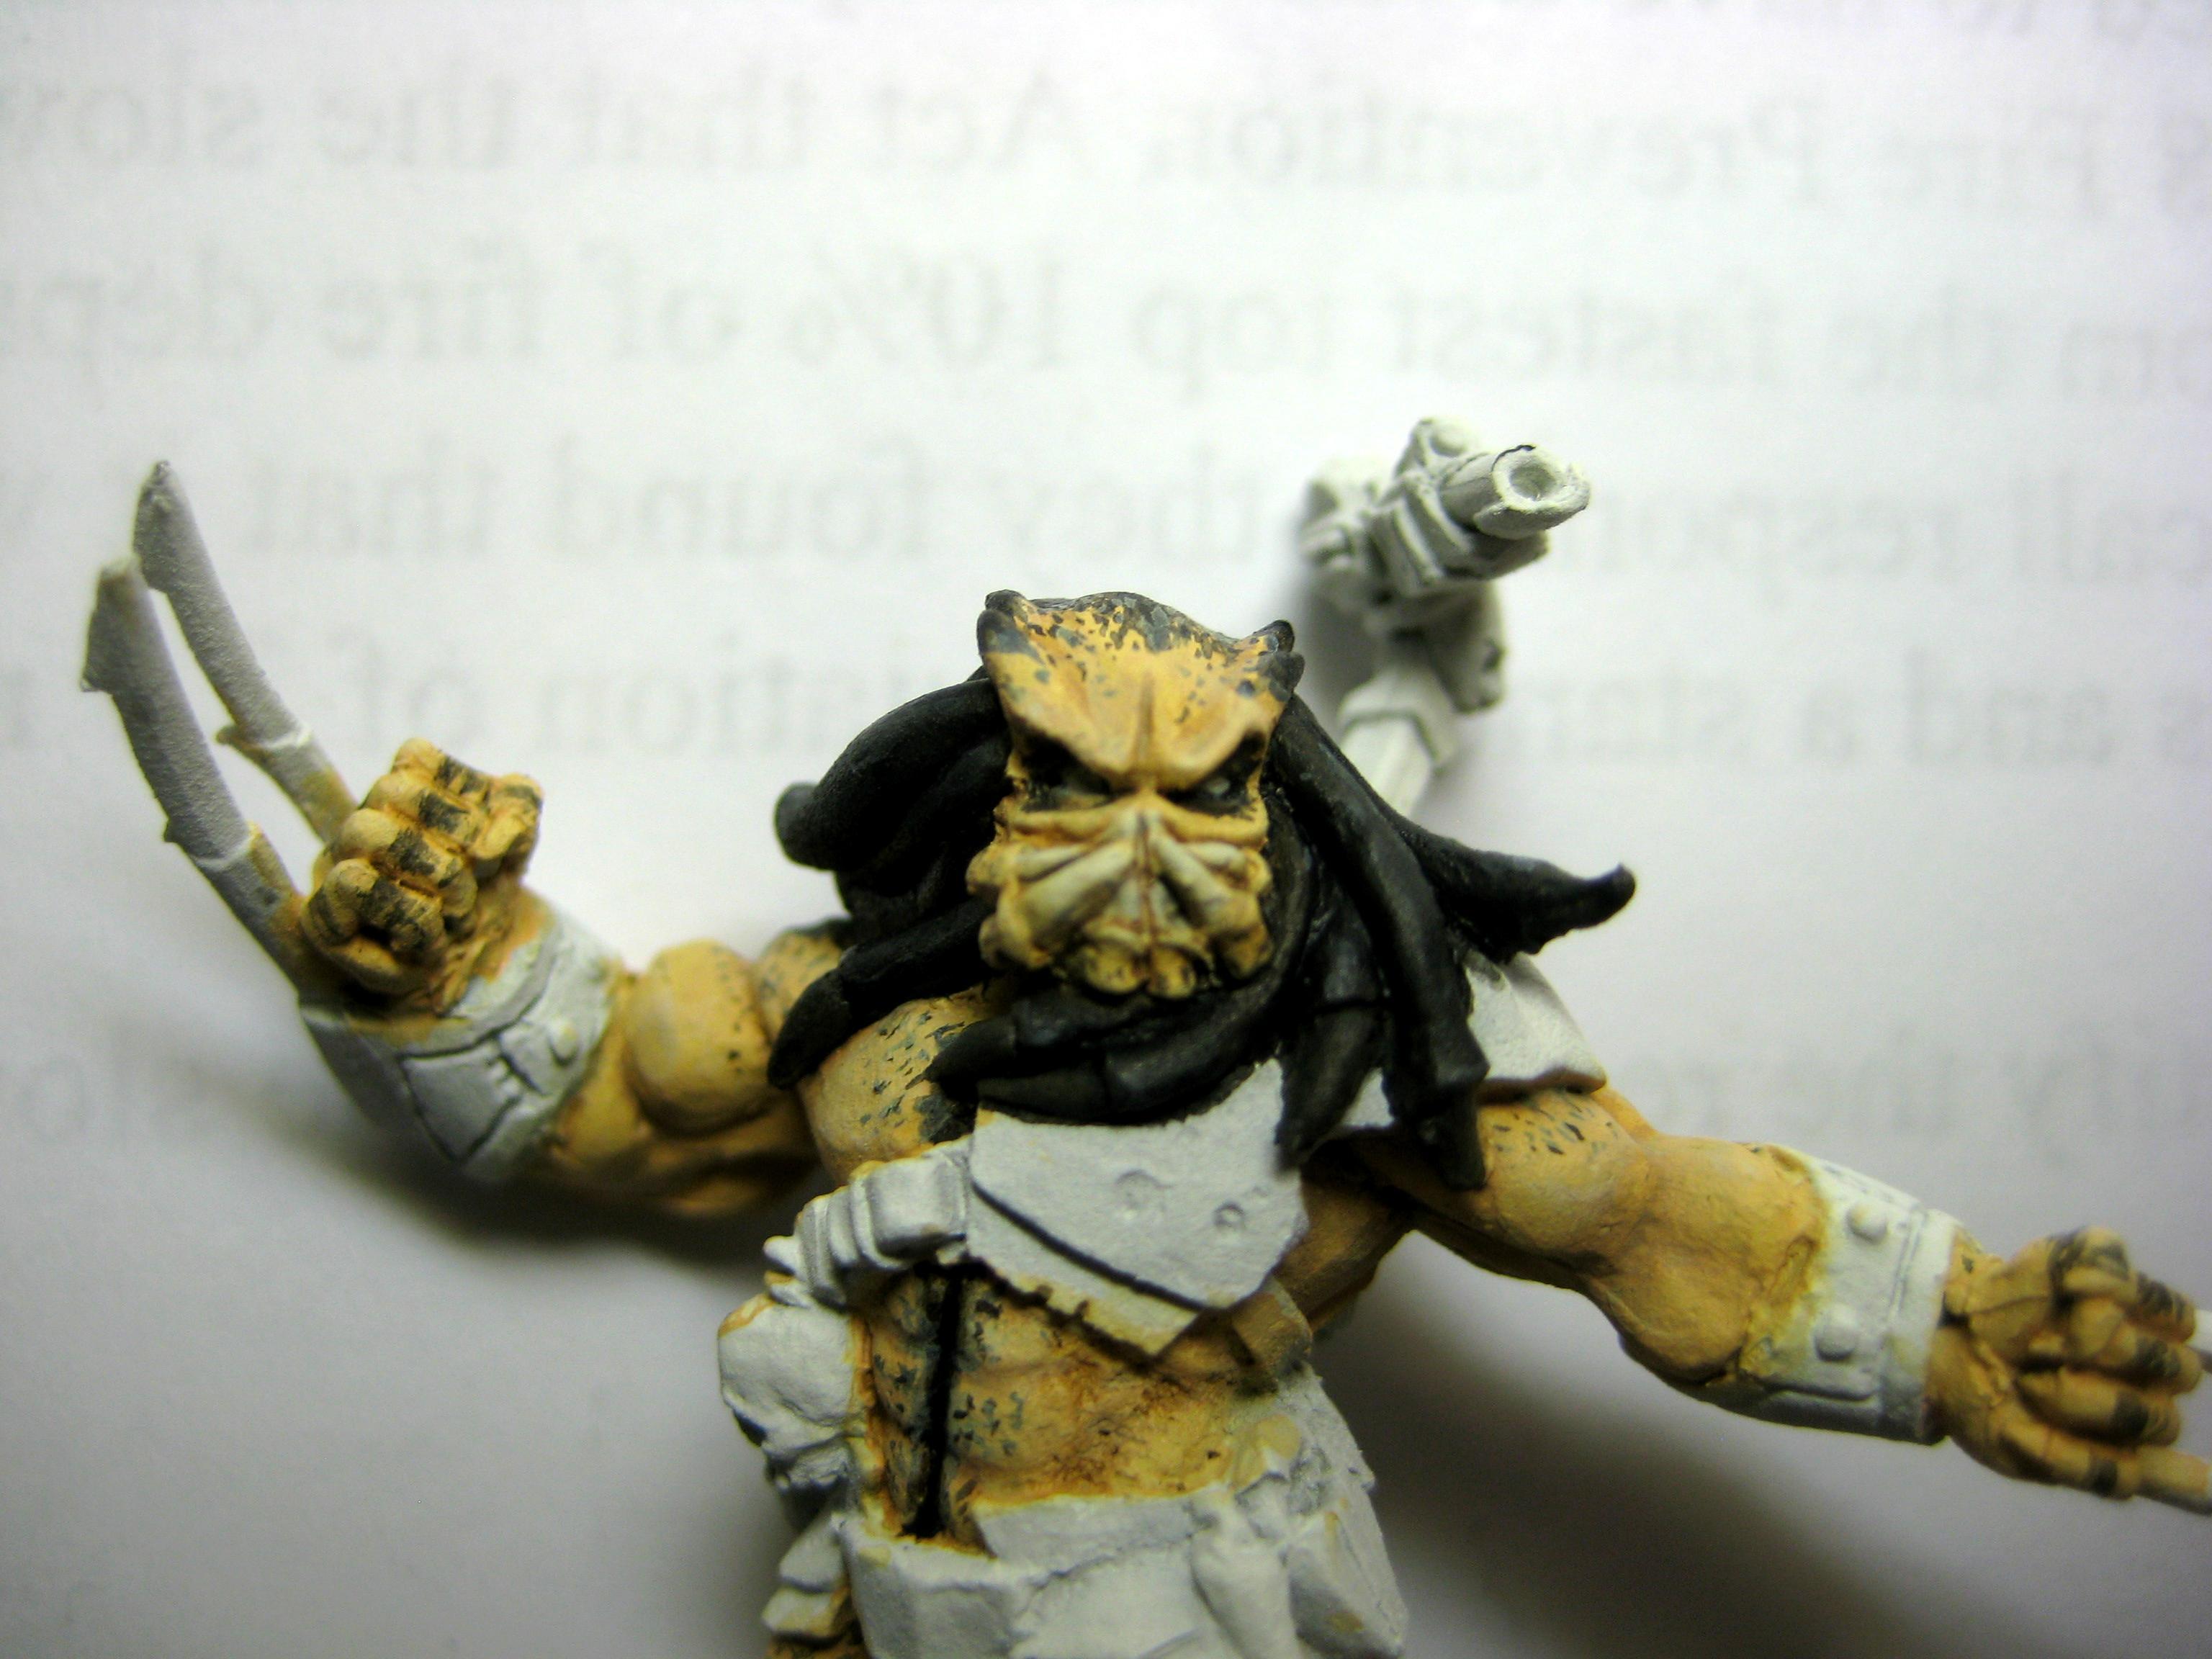 Heresy, Hurn, Inquisitor, Predator, Warhammer 40,000, Work In Progress